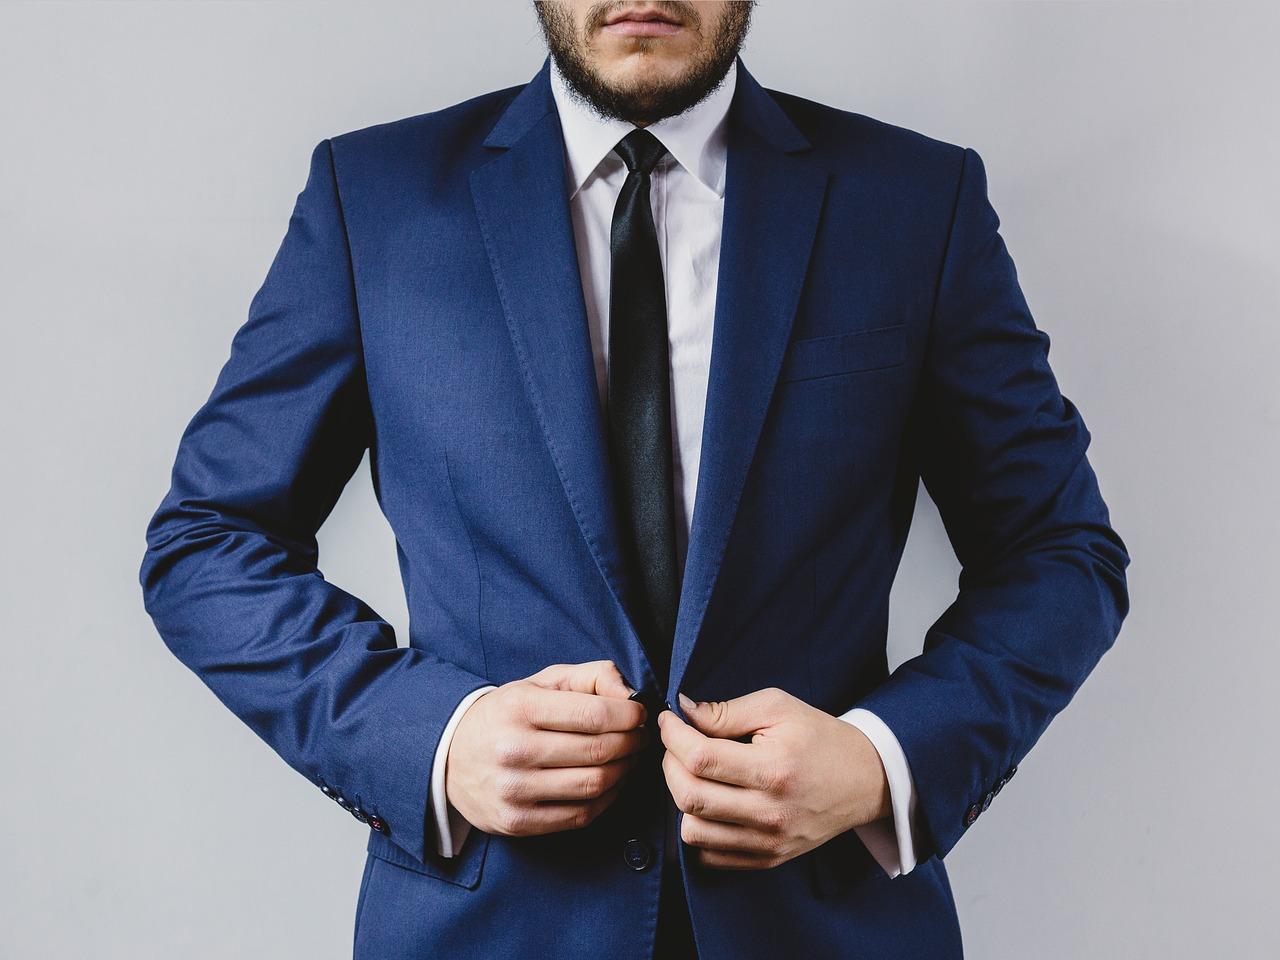 Blauer Anzug Braune Schuhe Geht Oder Geht Nicht Classwatch